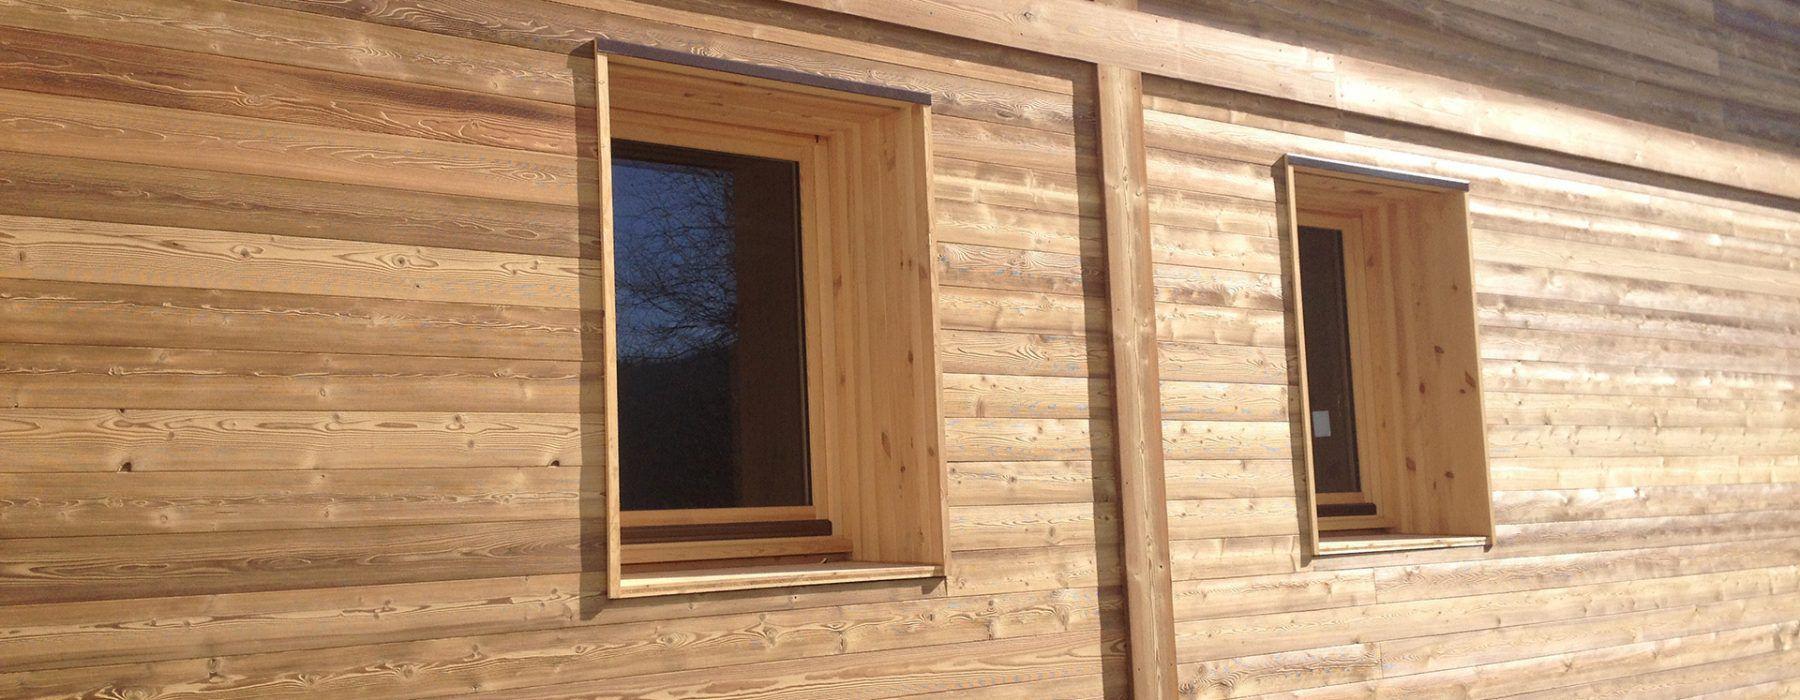 Wooden wall cladding / exterior / interior - MÉLÈZE DE SIBÉRIE ...